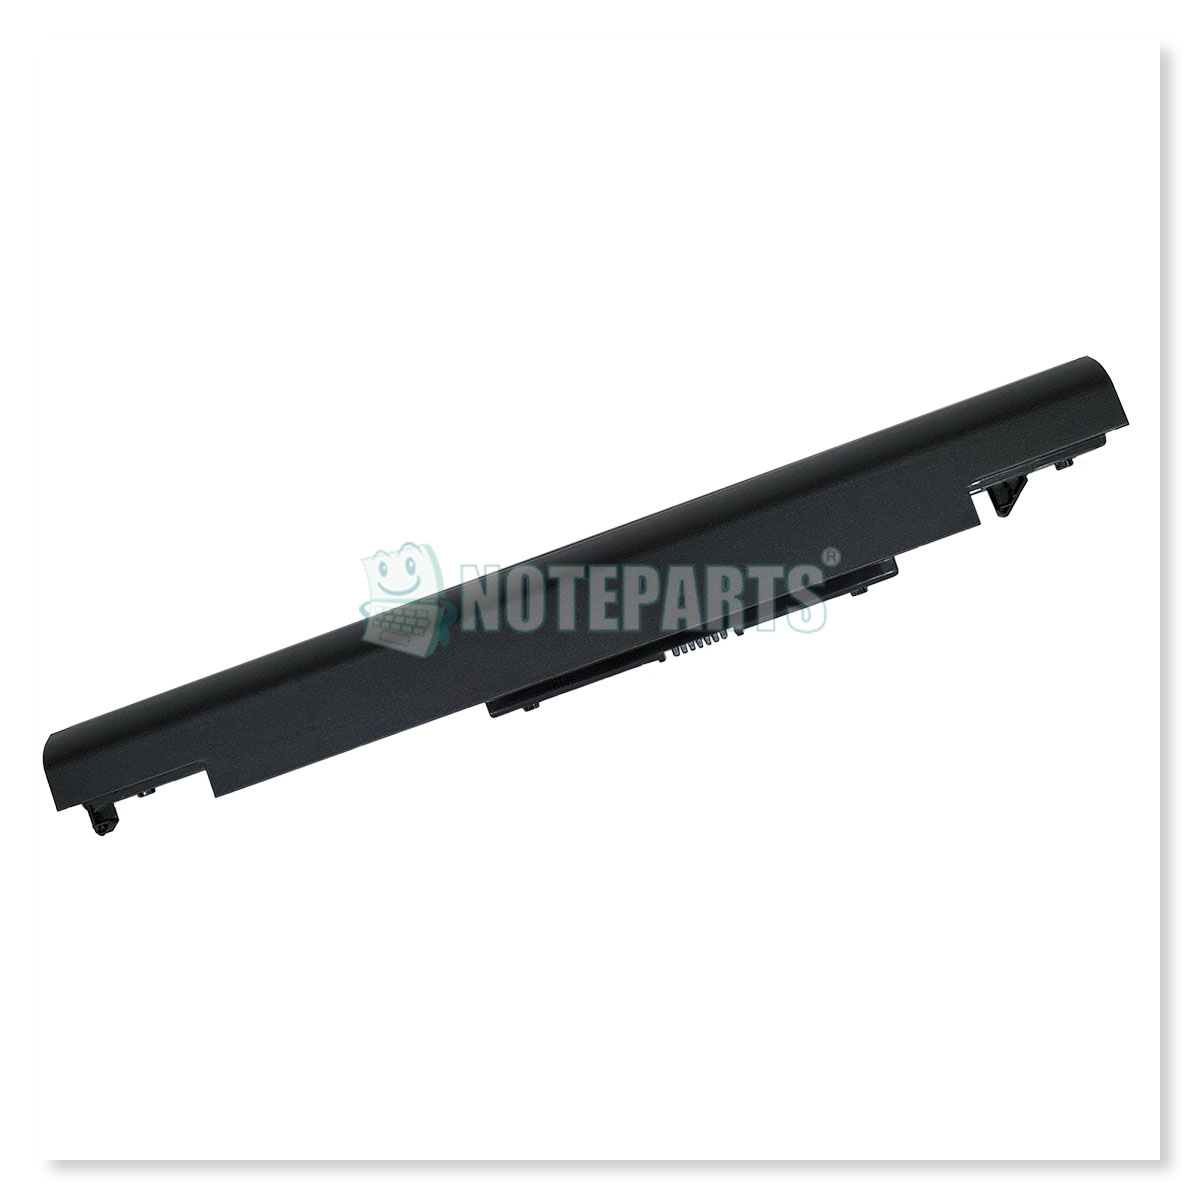 HP 15-bs000 15-bs100 15-bw000 17-bs000 250 G6 255 G6 バッテリー JC04 919681-221 919700-850対応